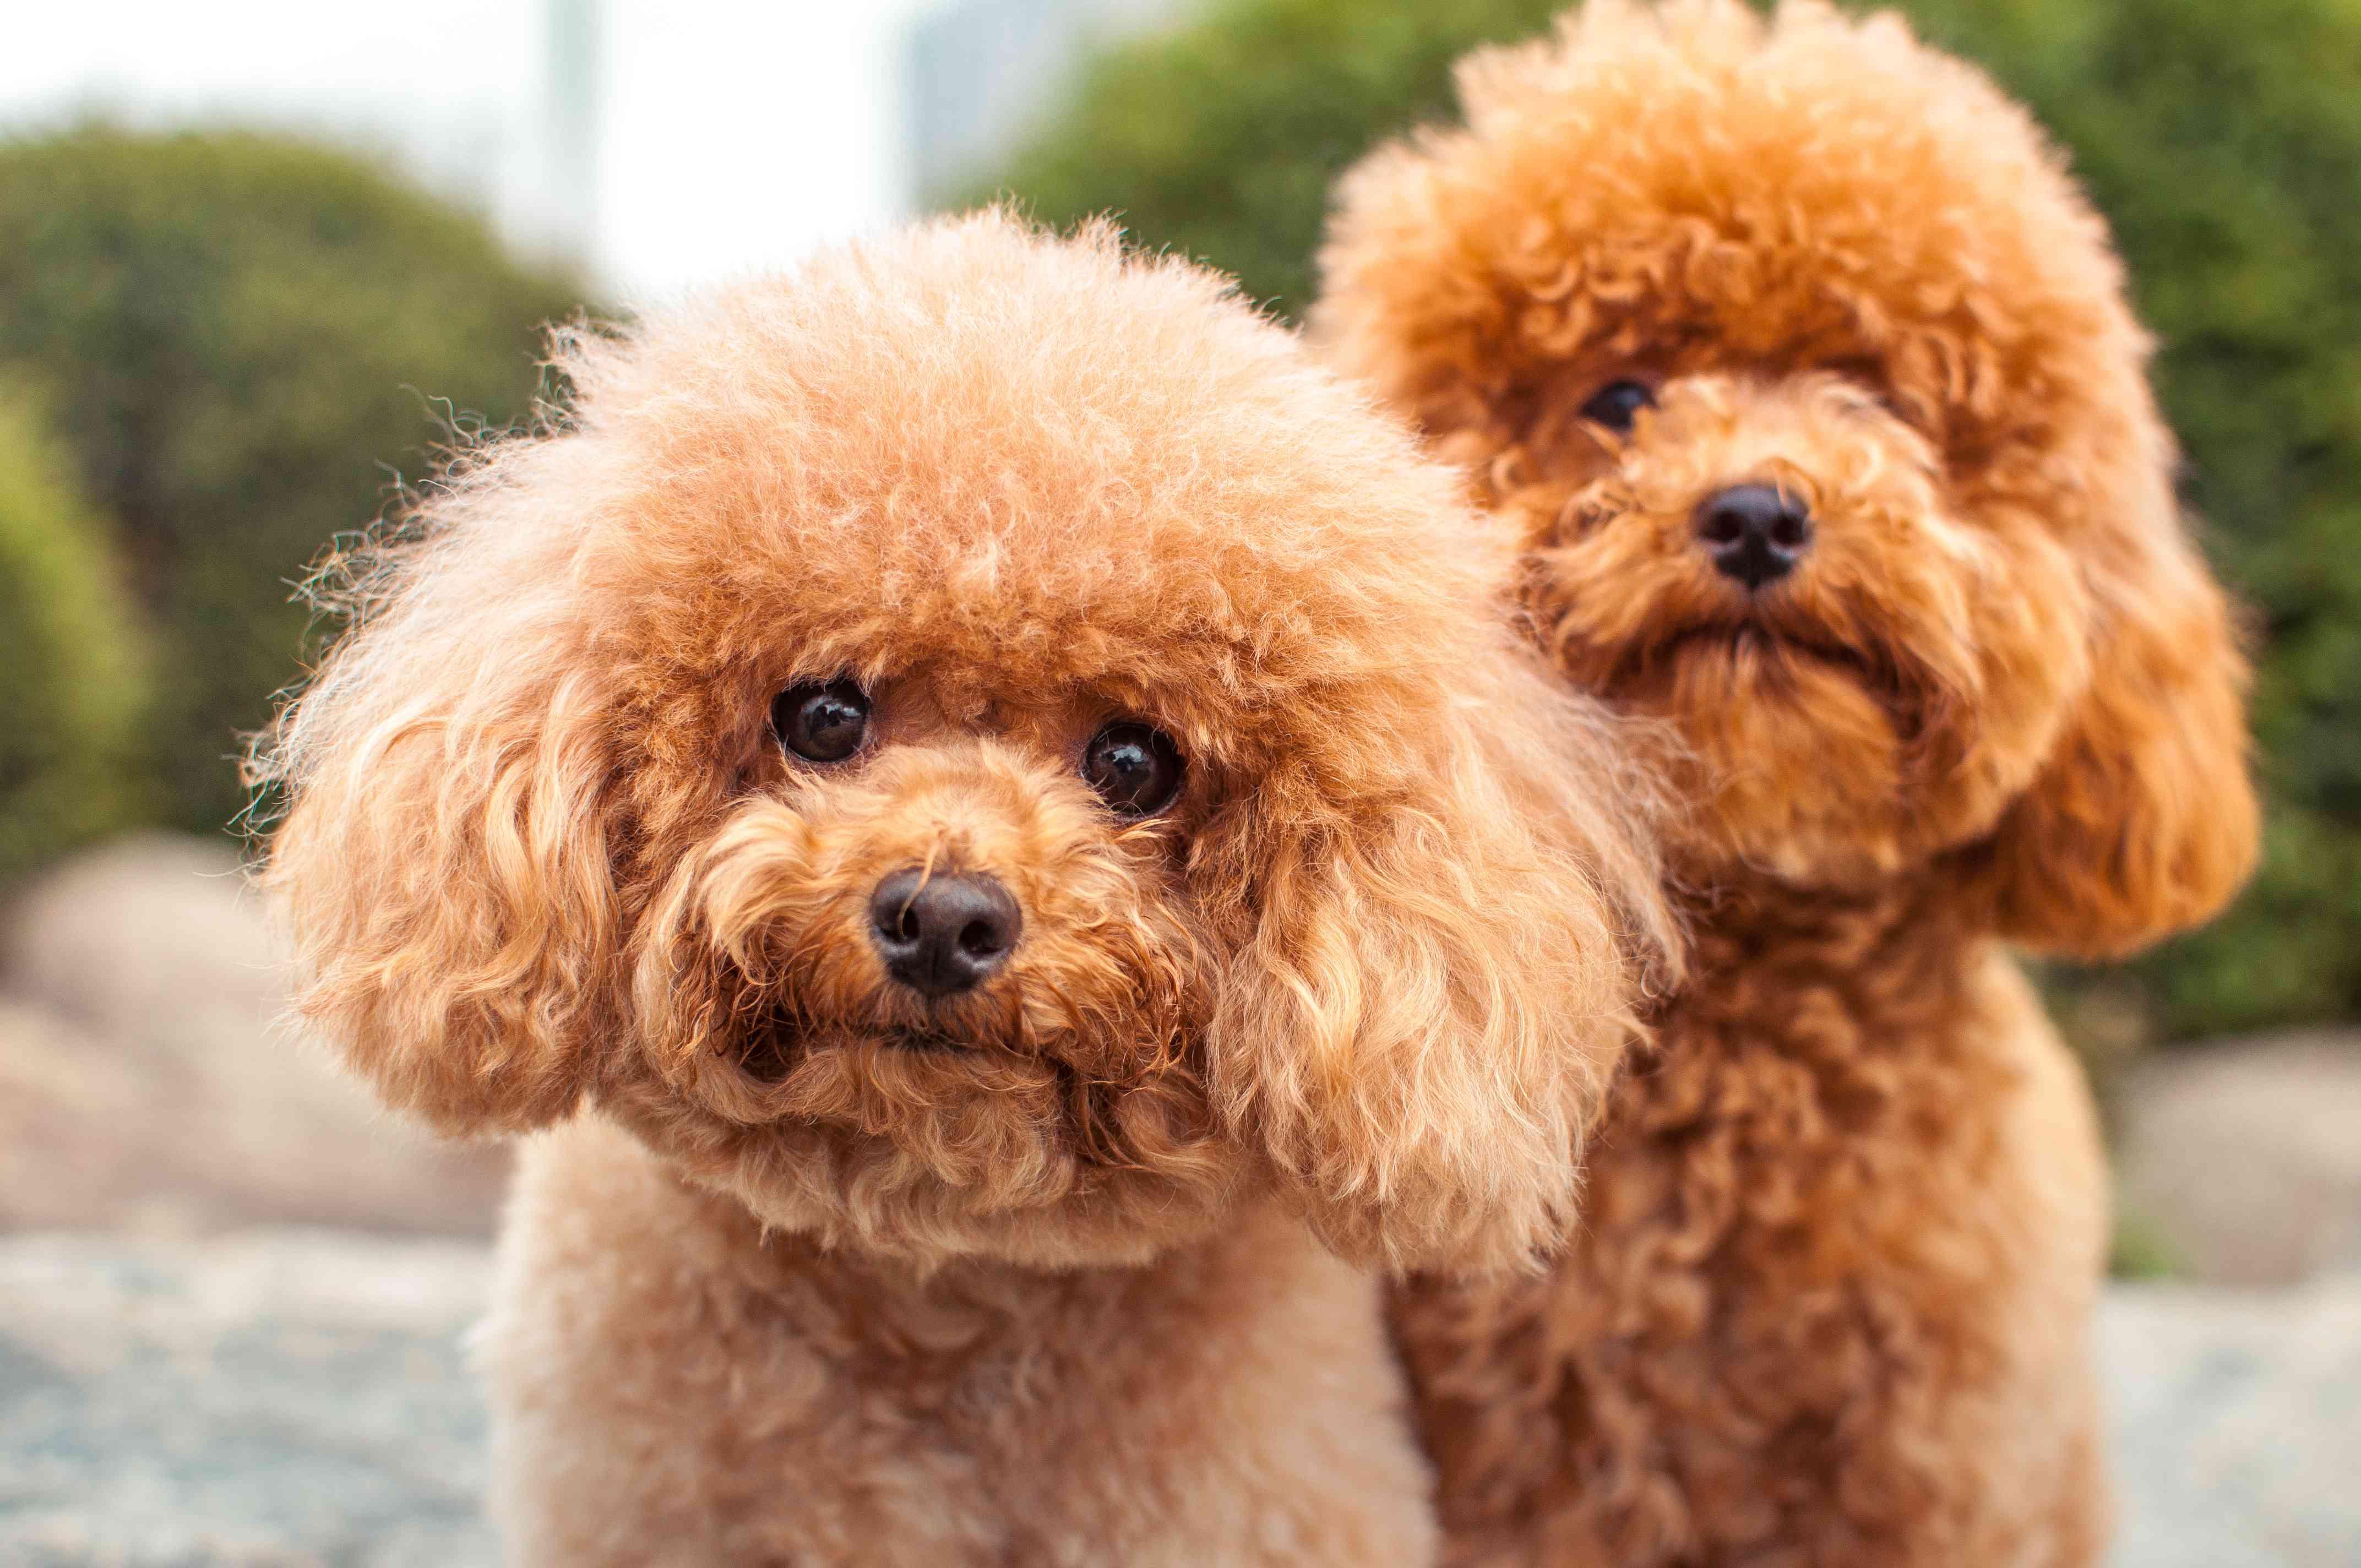 Two friendly poodles